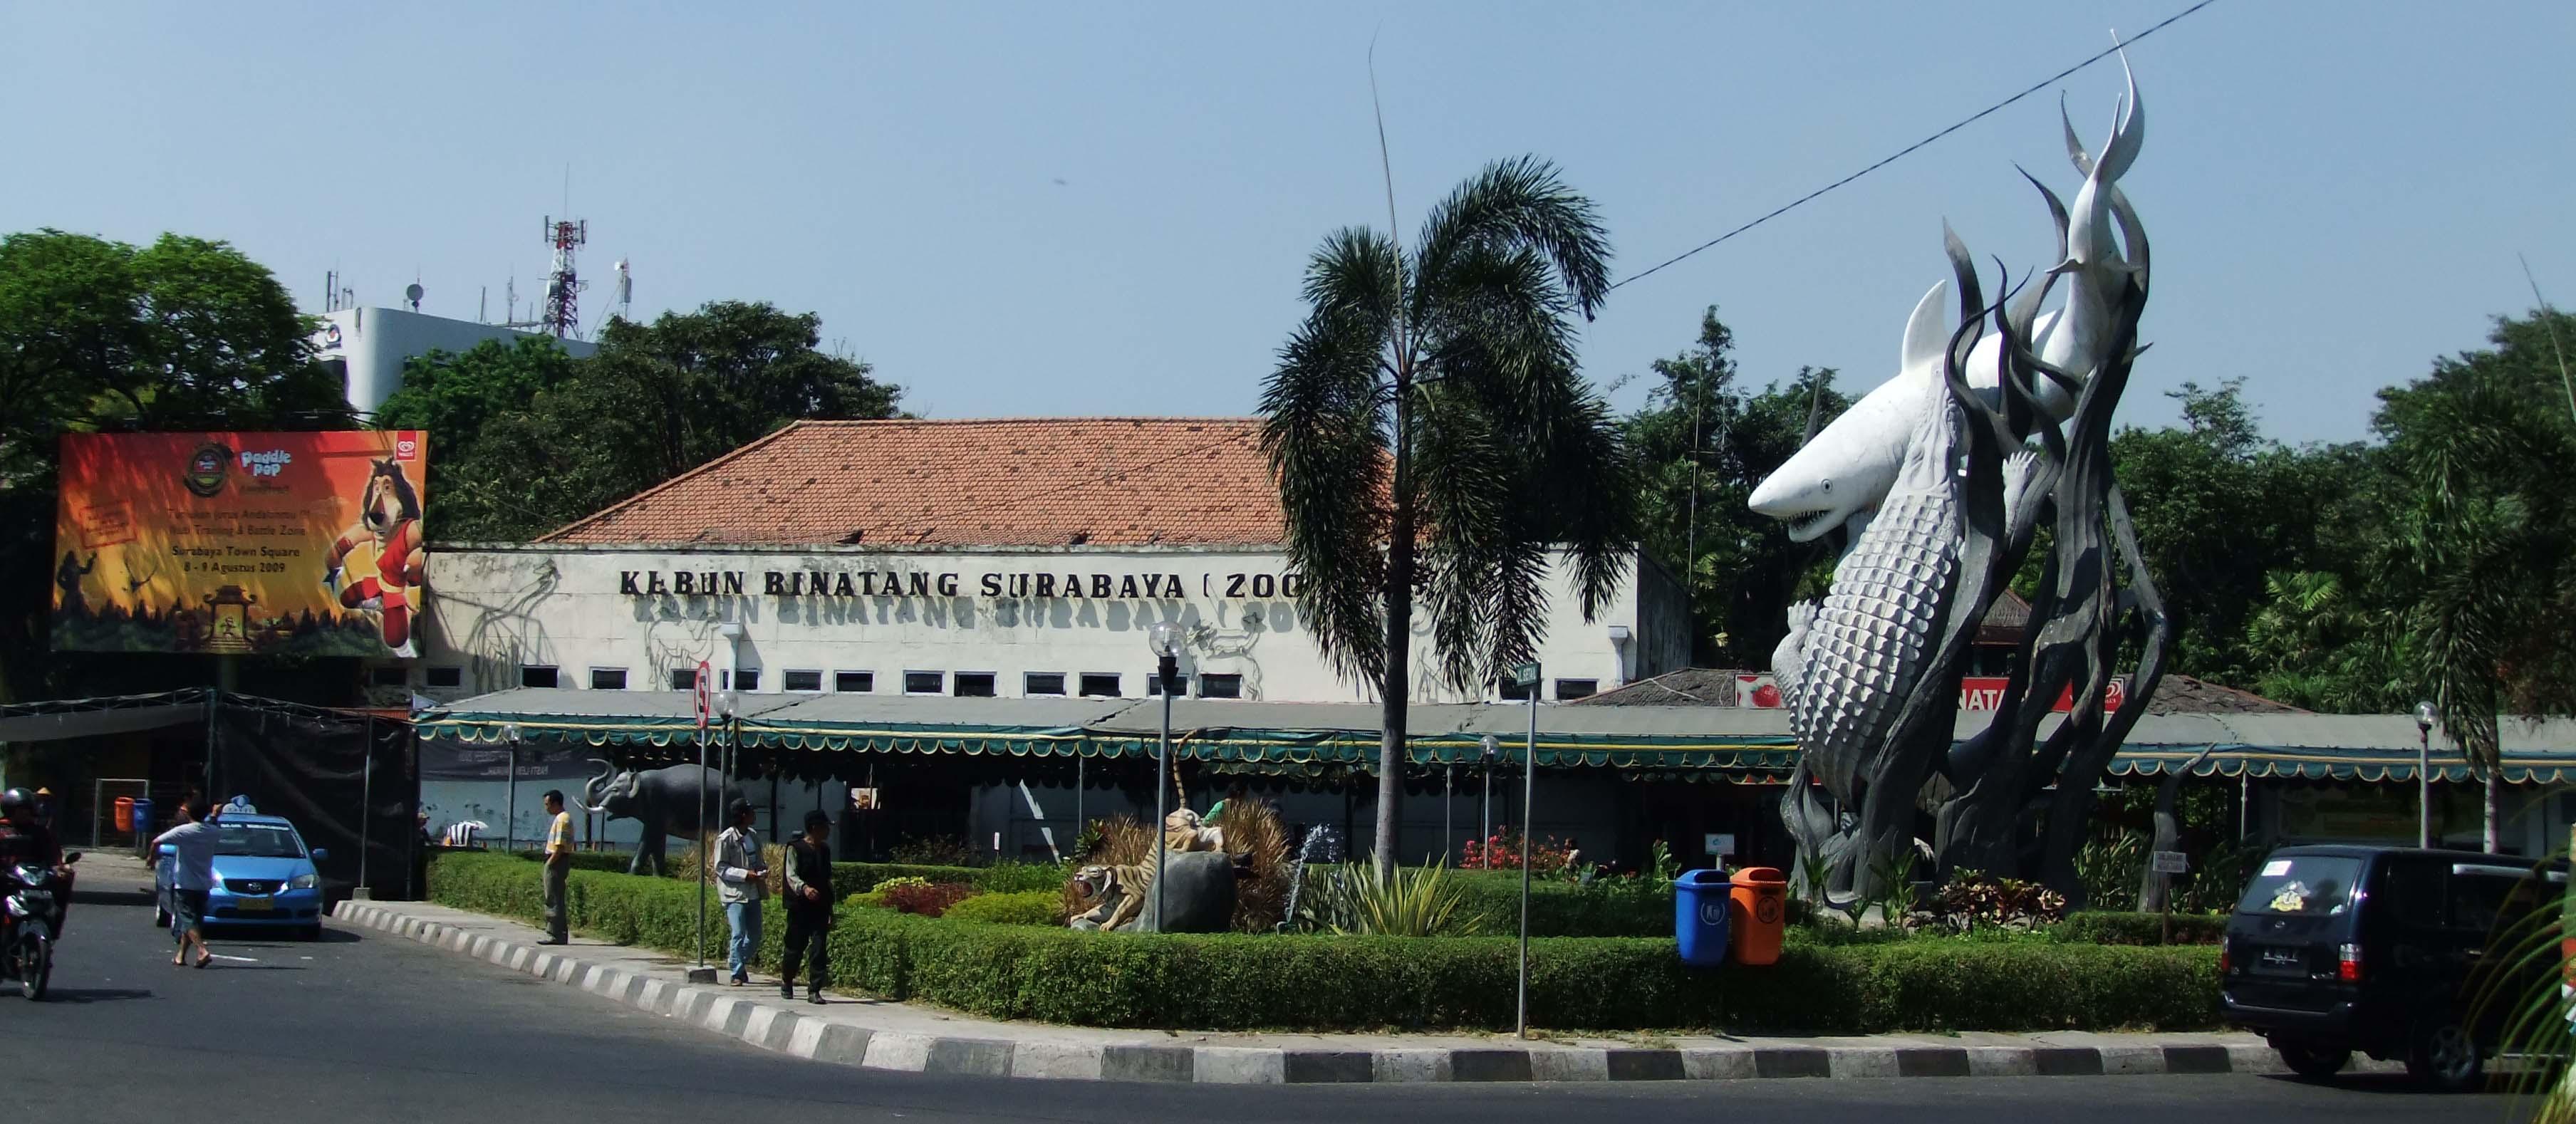 SURABAYA Zoo - Wikipedia, the free encyclopedia